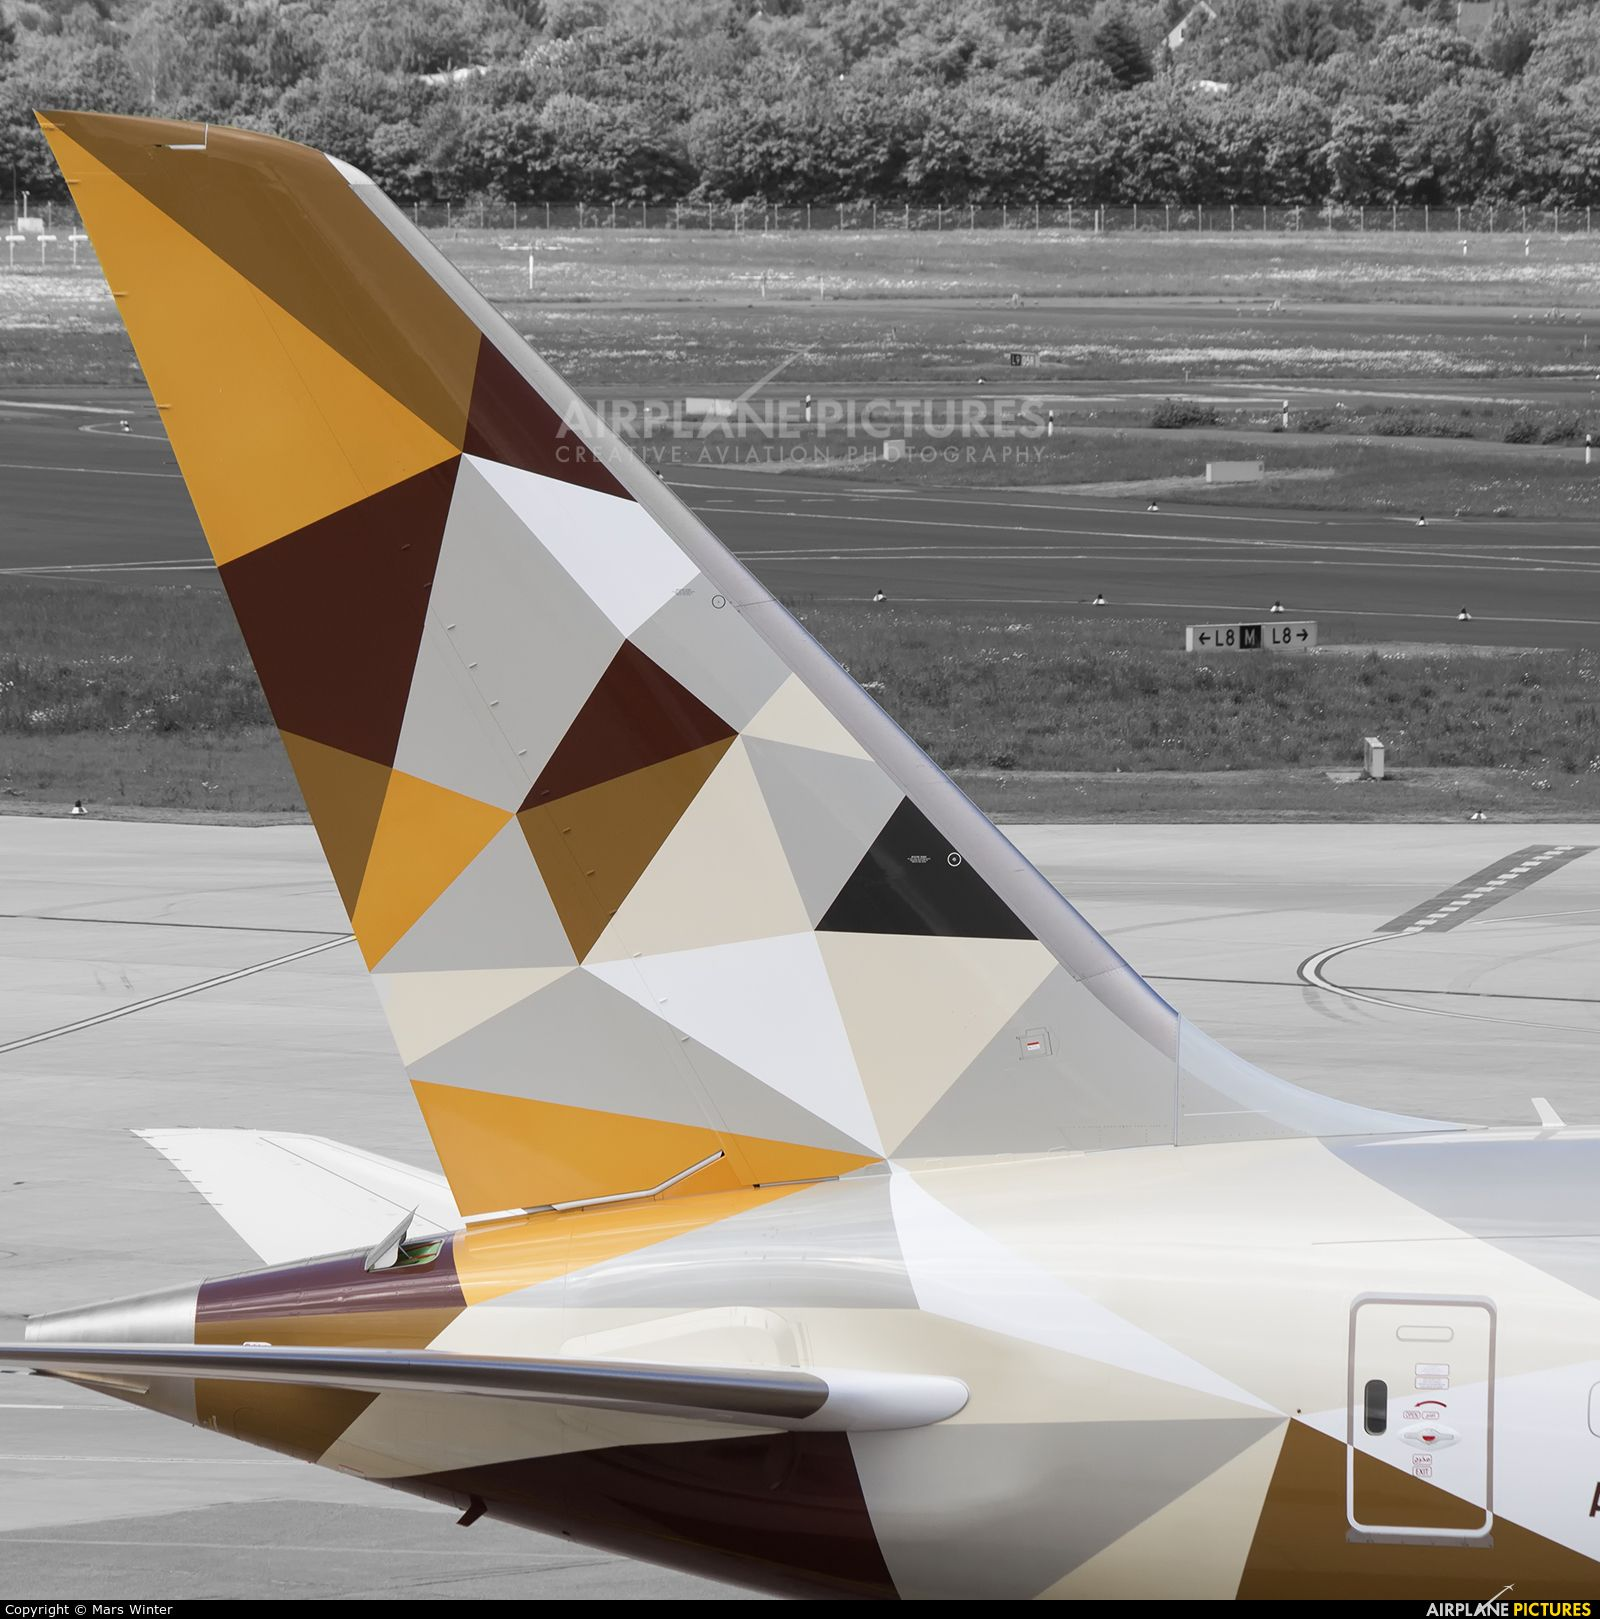 Etihad Airways A6-BLF aircraft at Düsseldorf photo